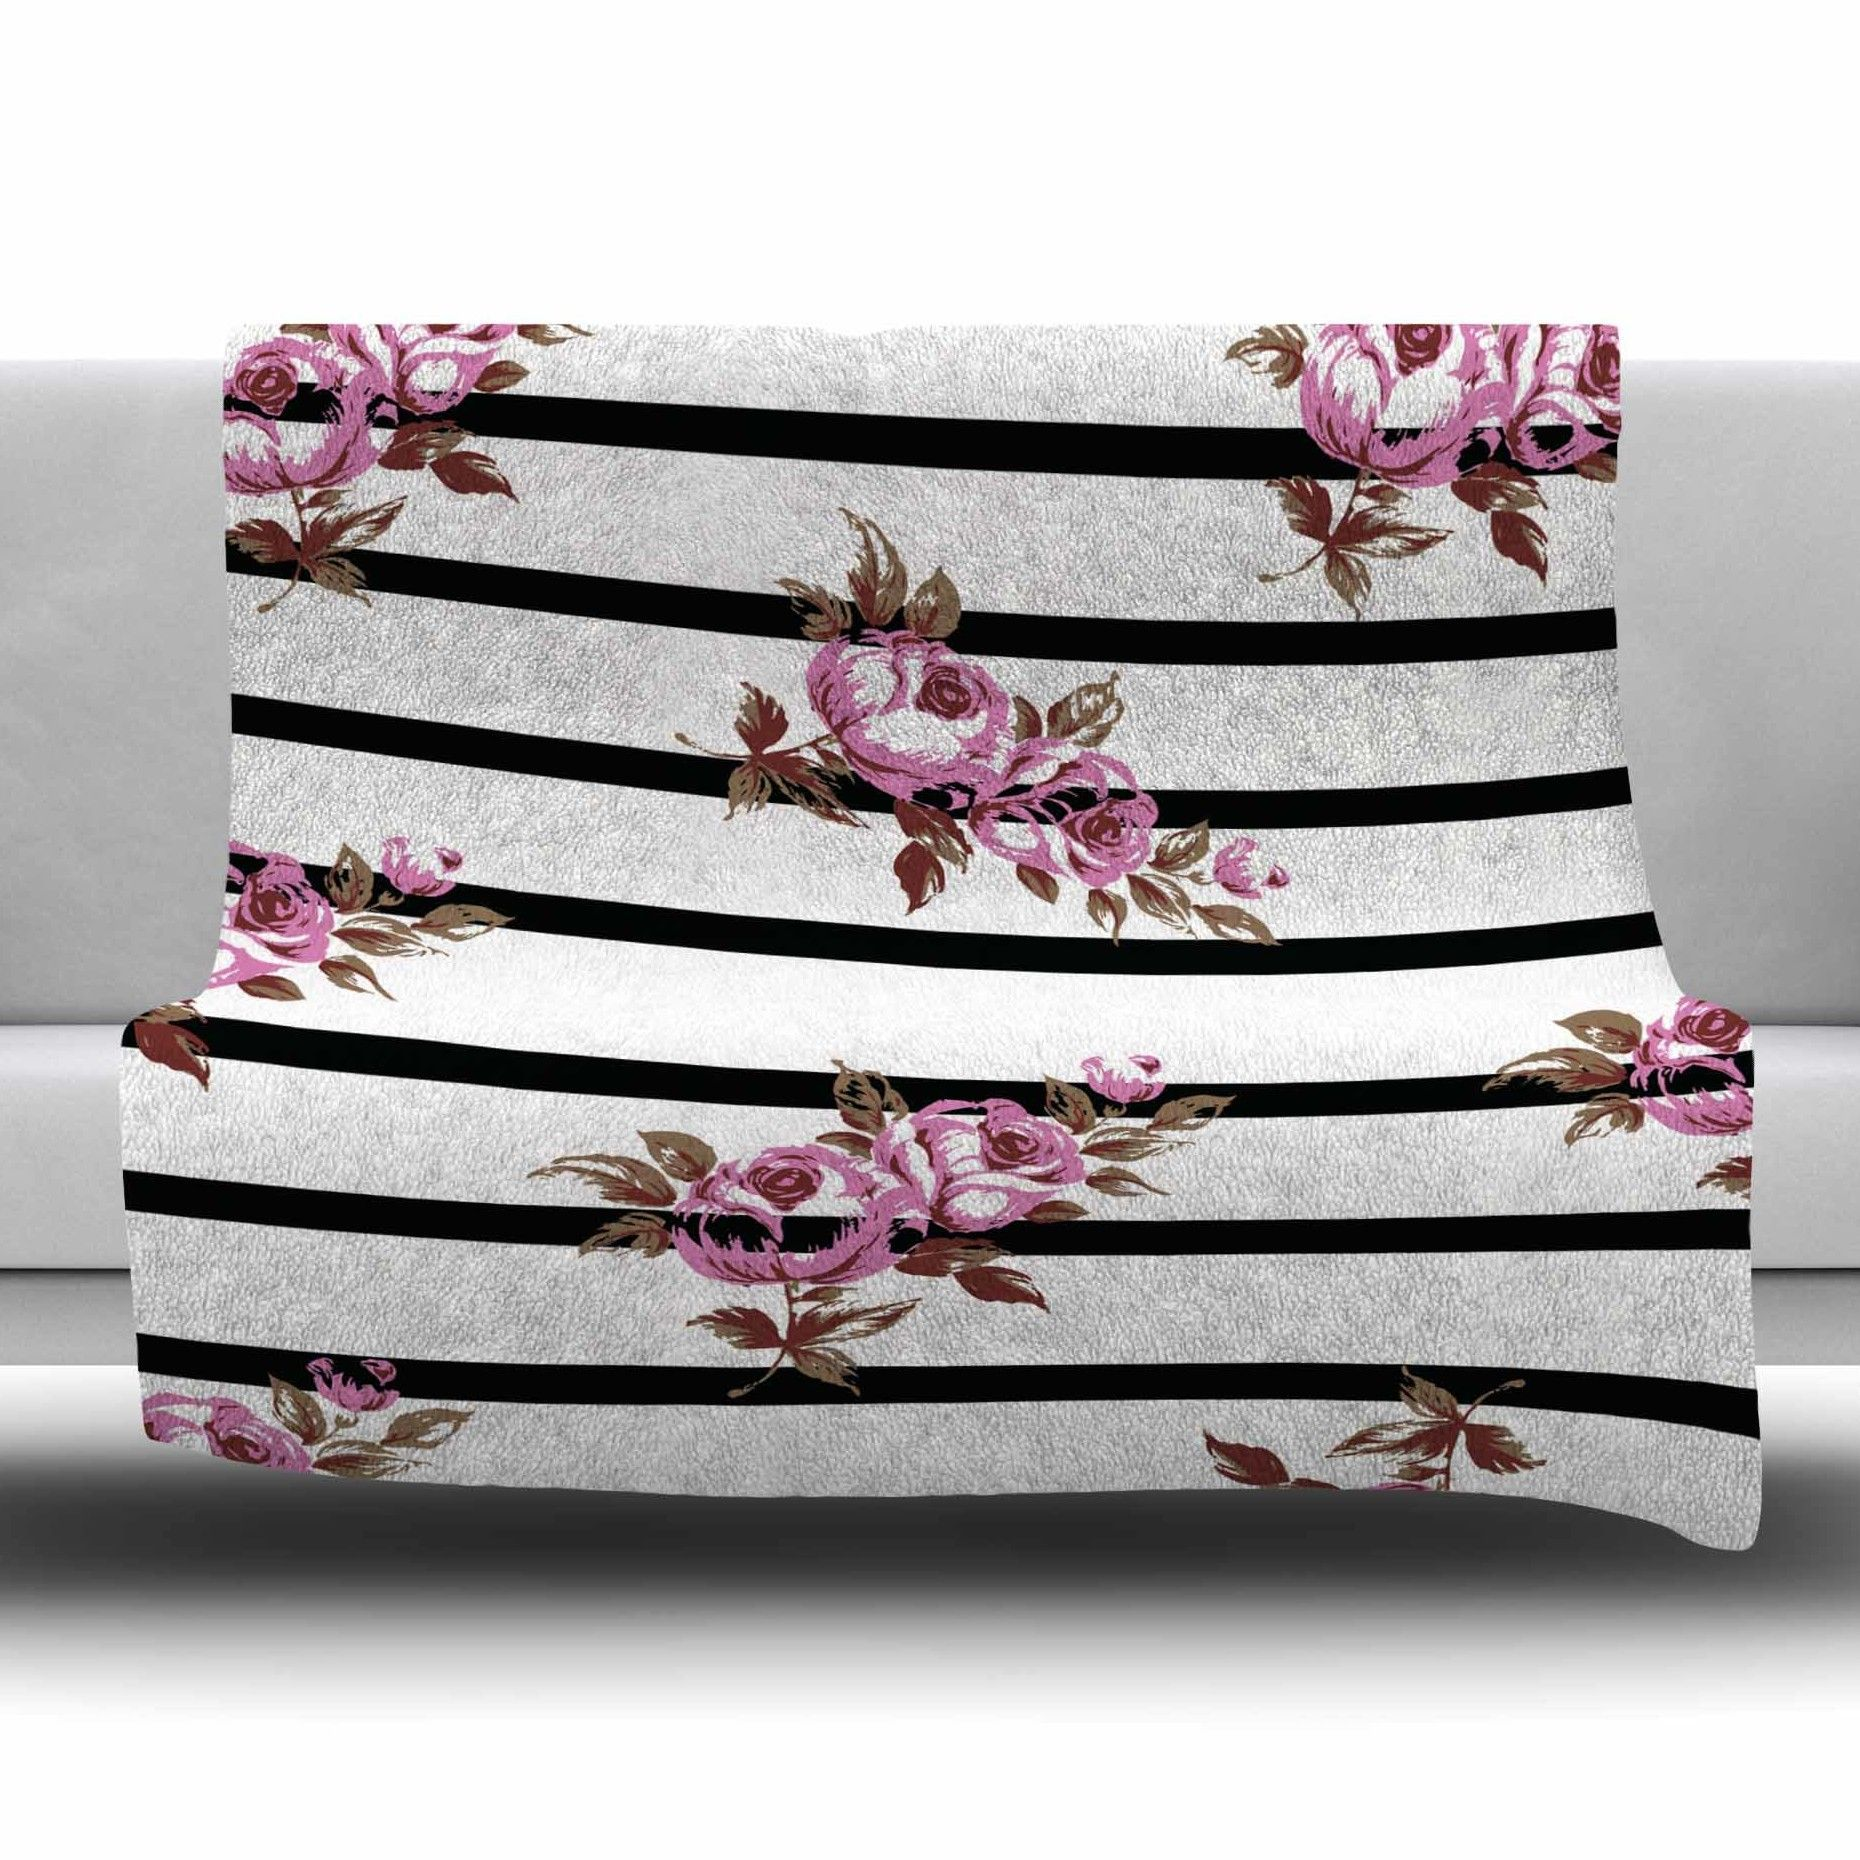 Floral Strips by NL Designs Fleece Blanket